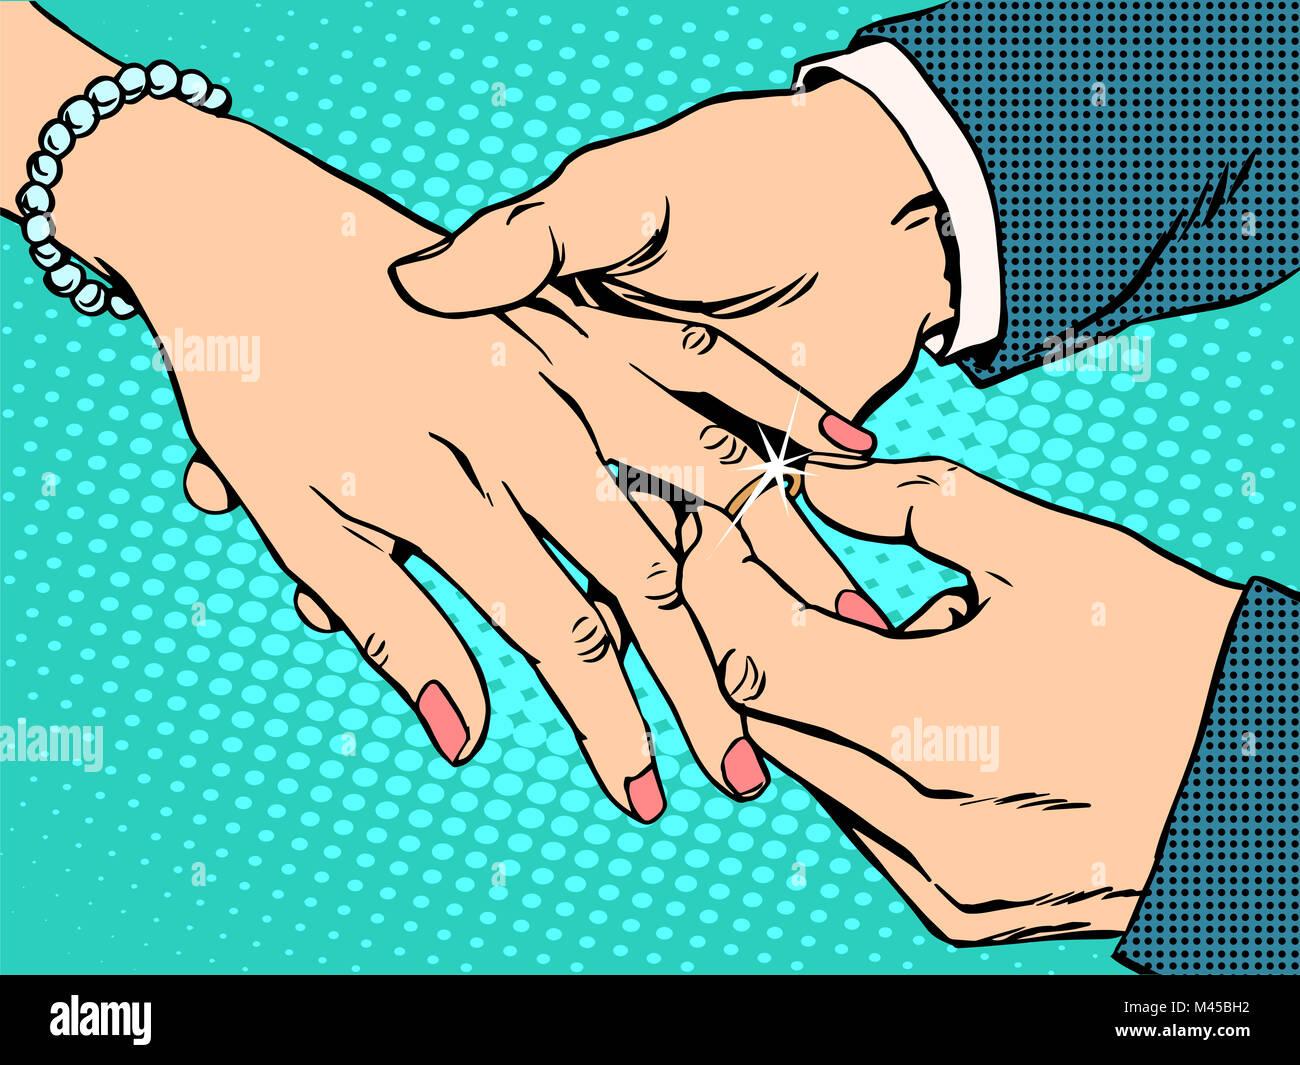 betrothal wedding bride groom gold ring - Stock Image